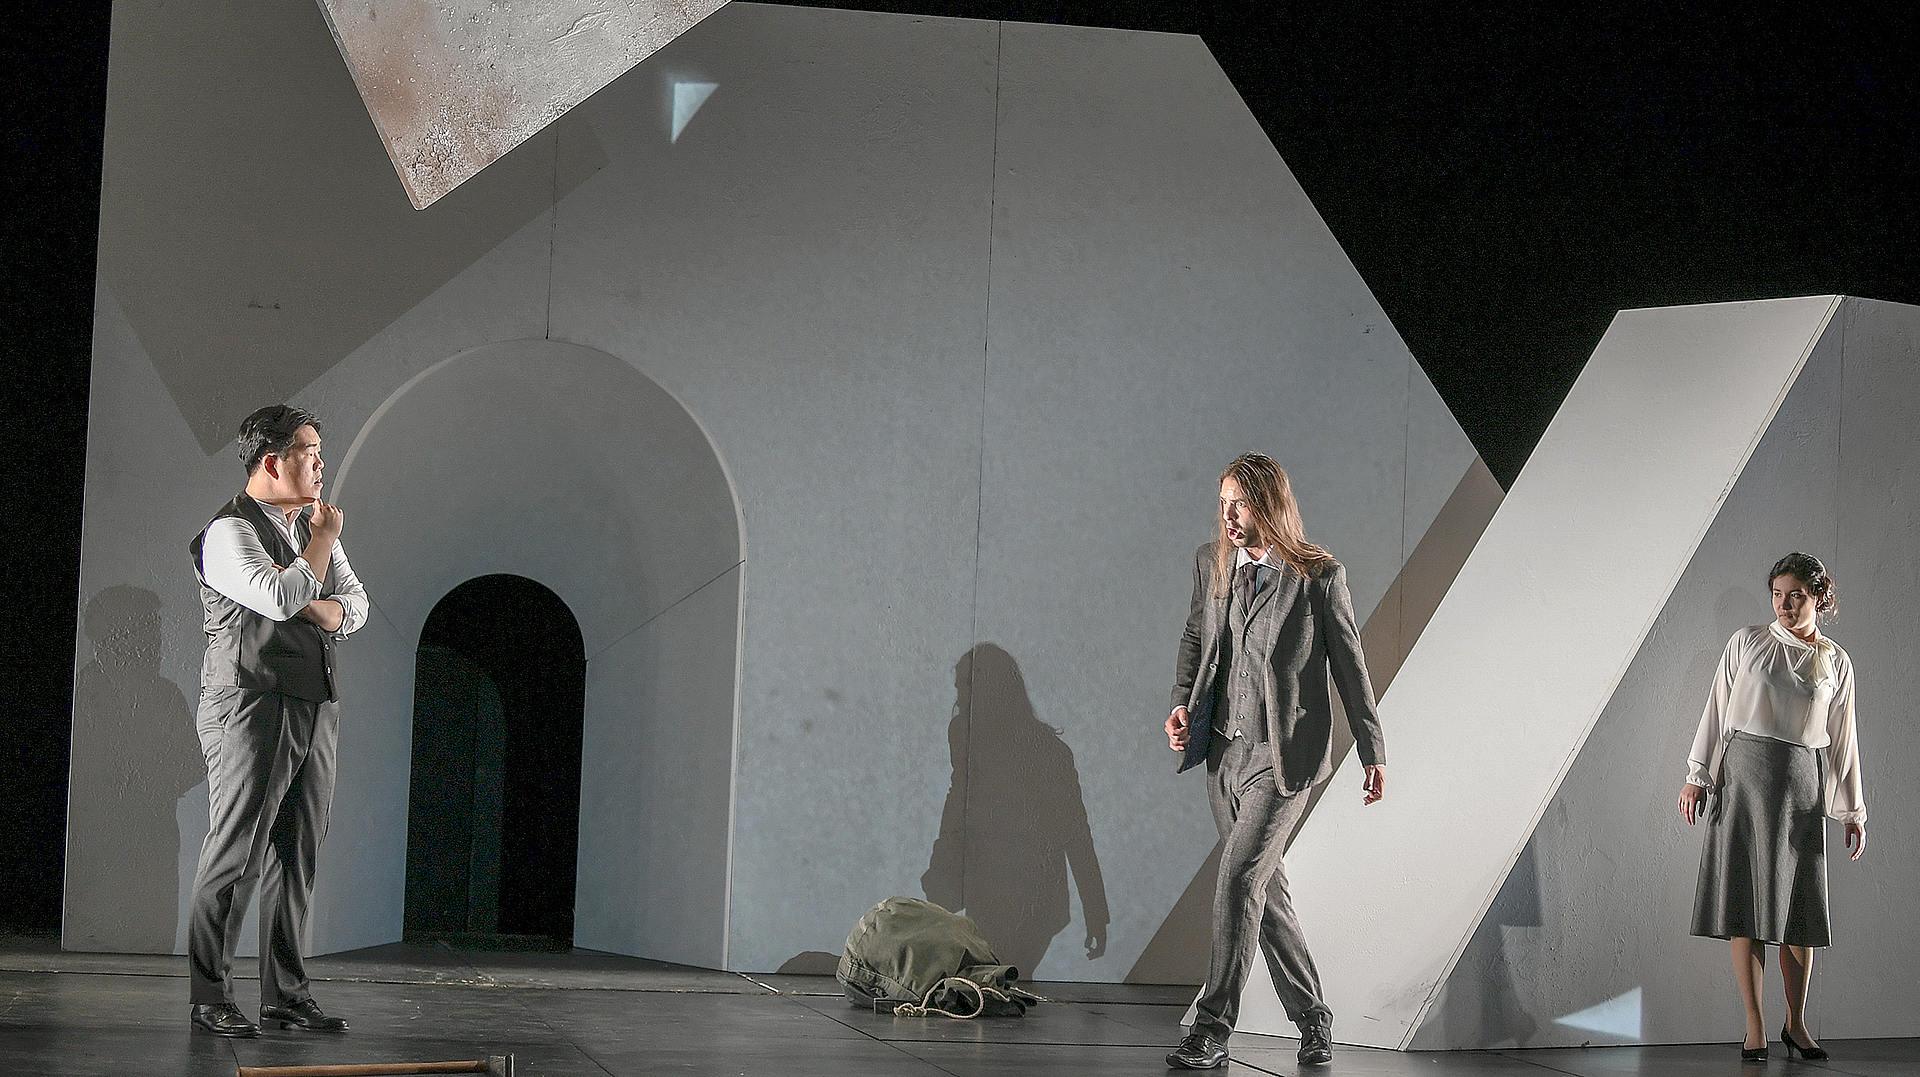 Seungjin Park als Son beau-père, Konrad Furian als Le matelot und Mariko Lepage als Sa femme, Foto: Sebastian Hoppe